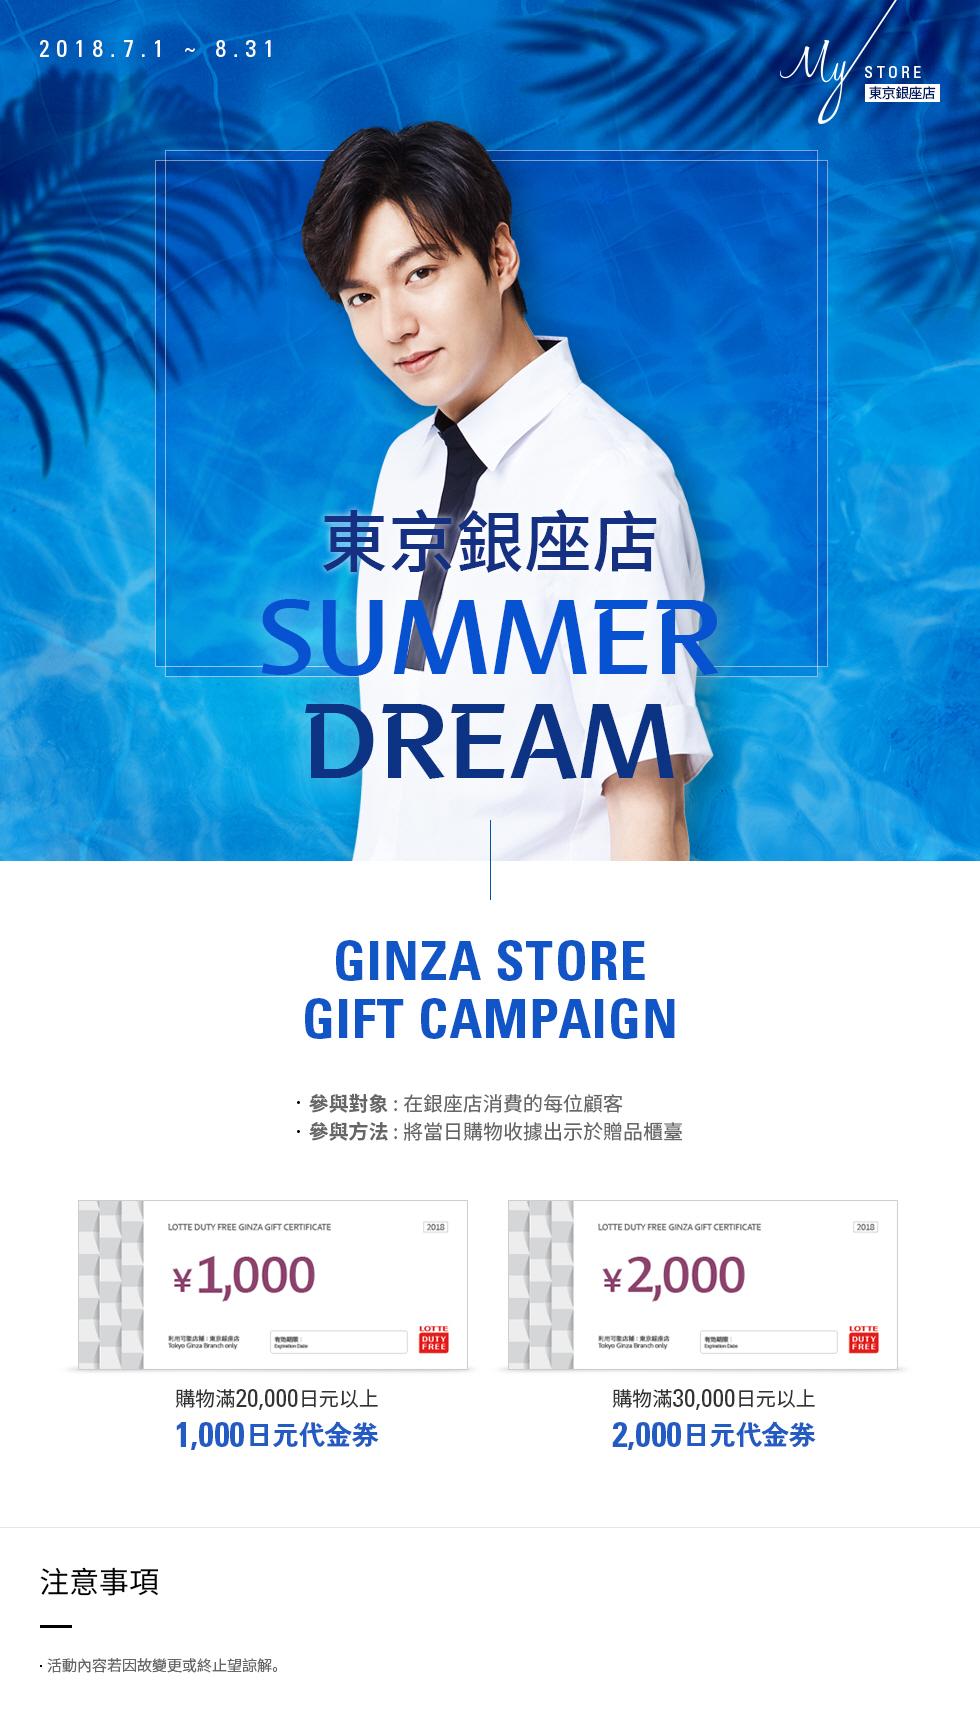 [東京銀座店] SUMMER DREAM